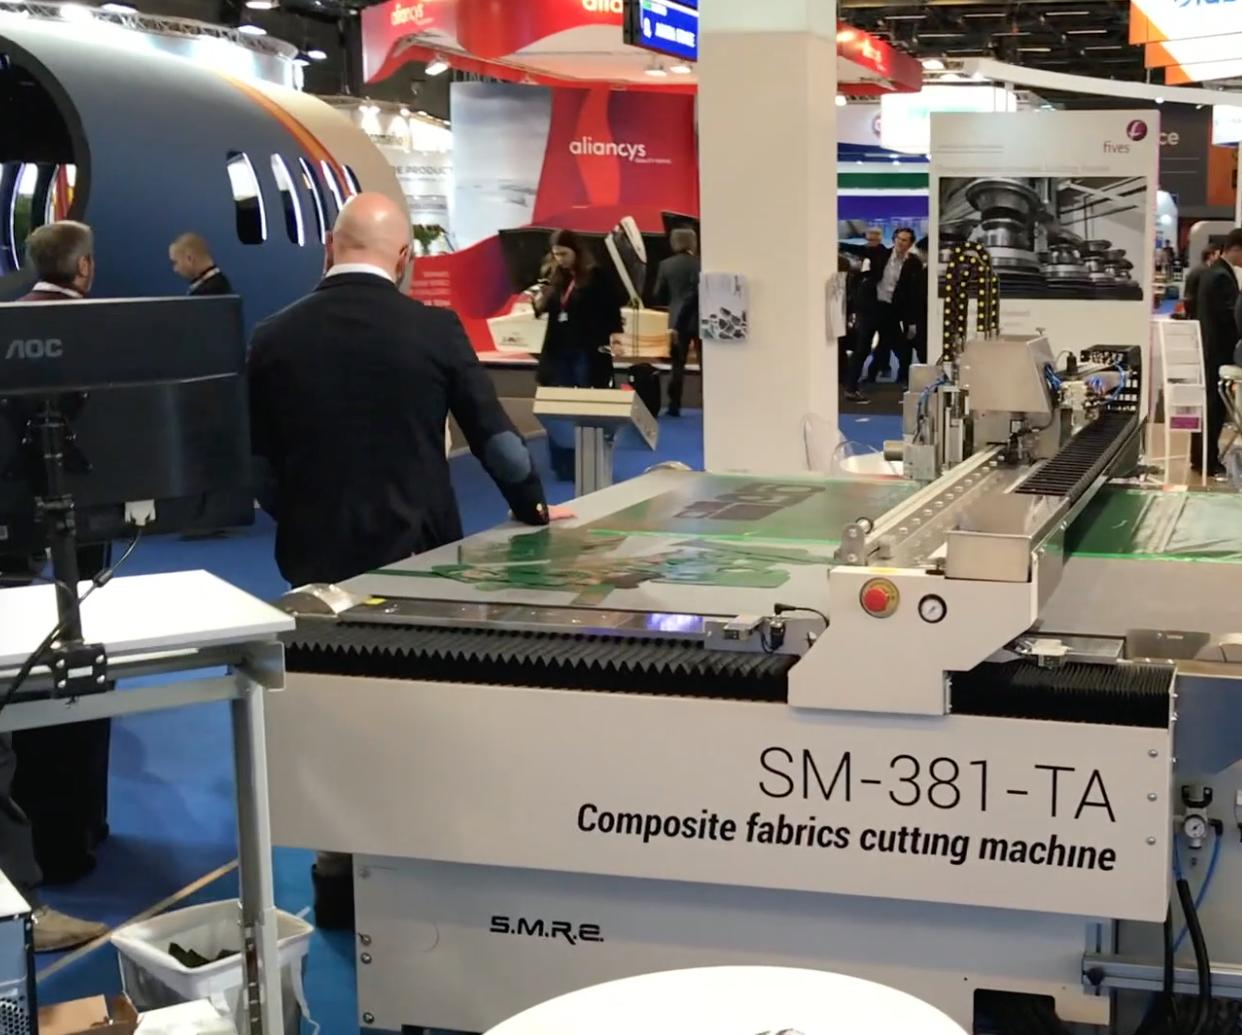 composite fabrics cutting machine